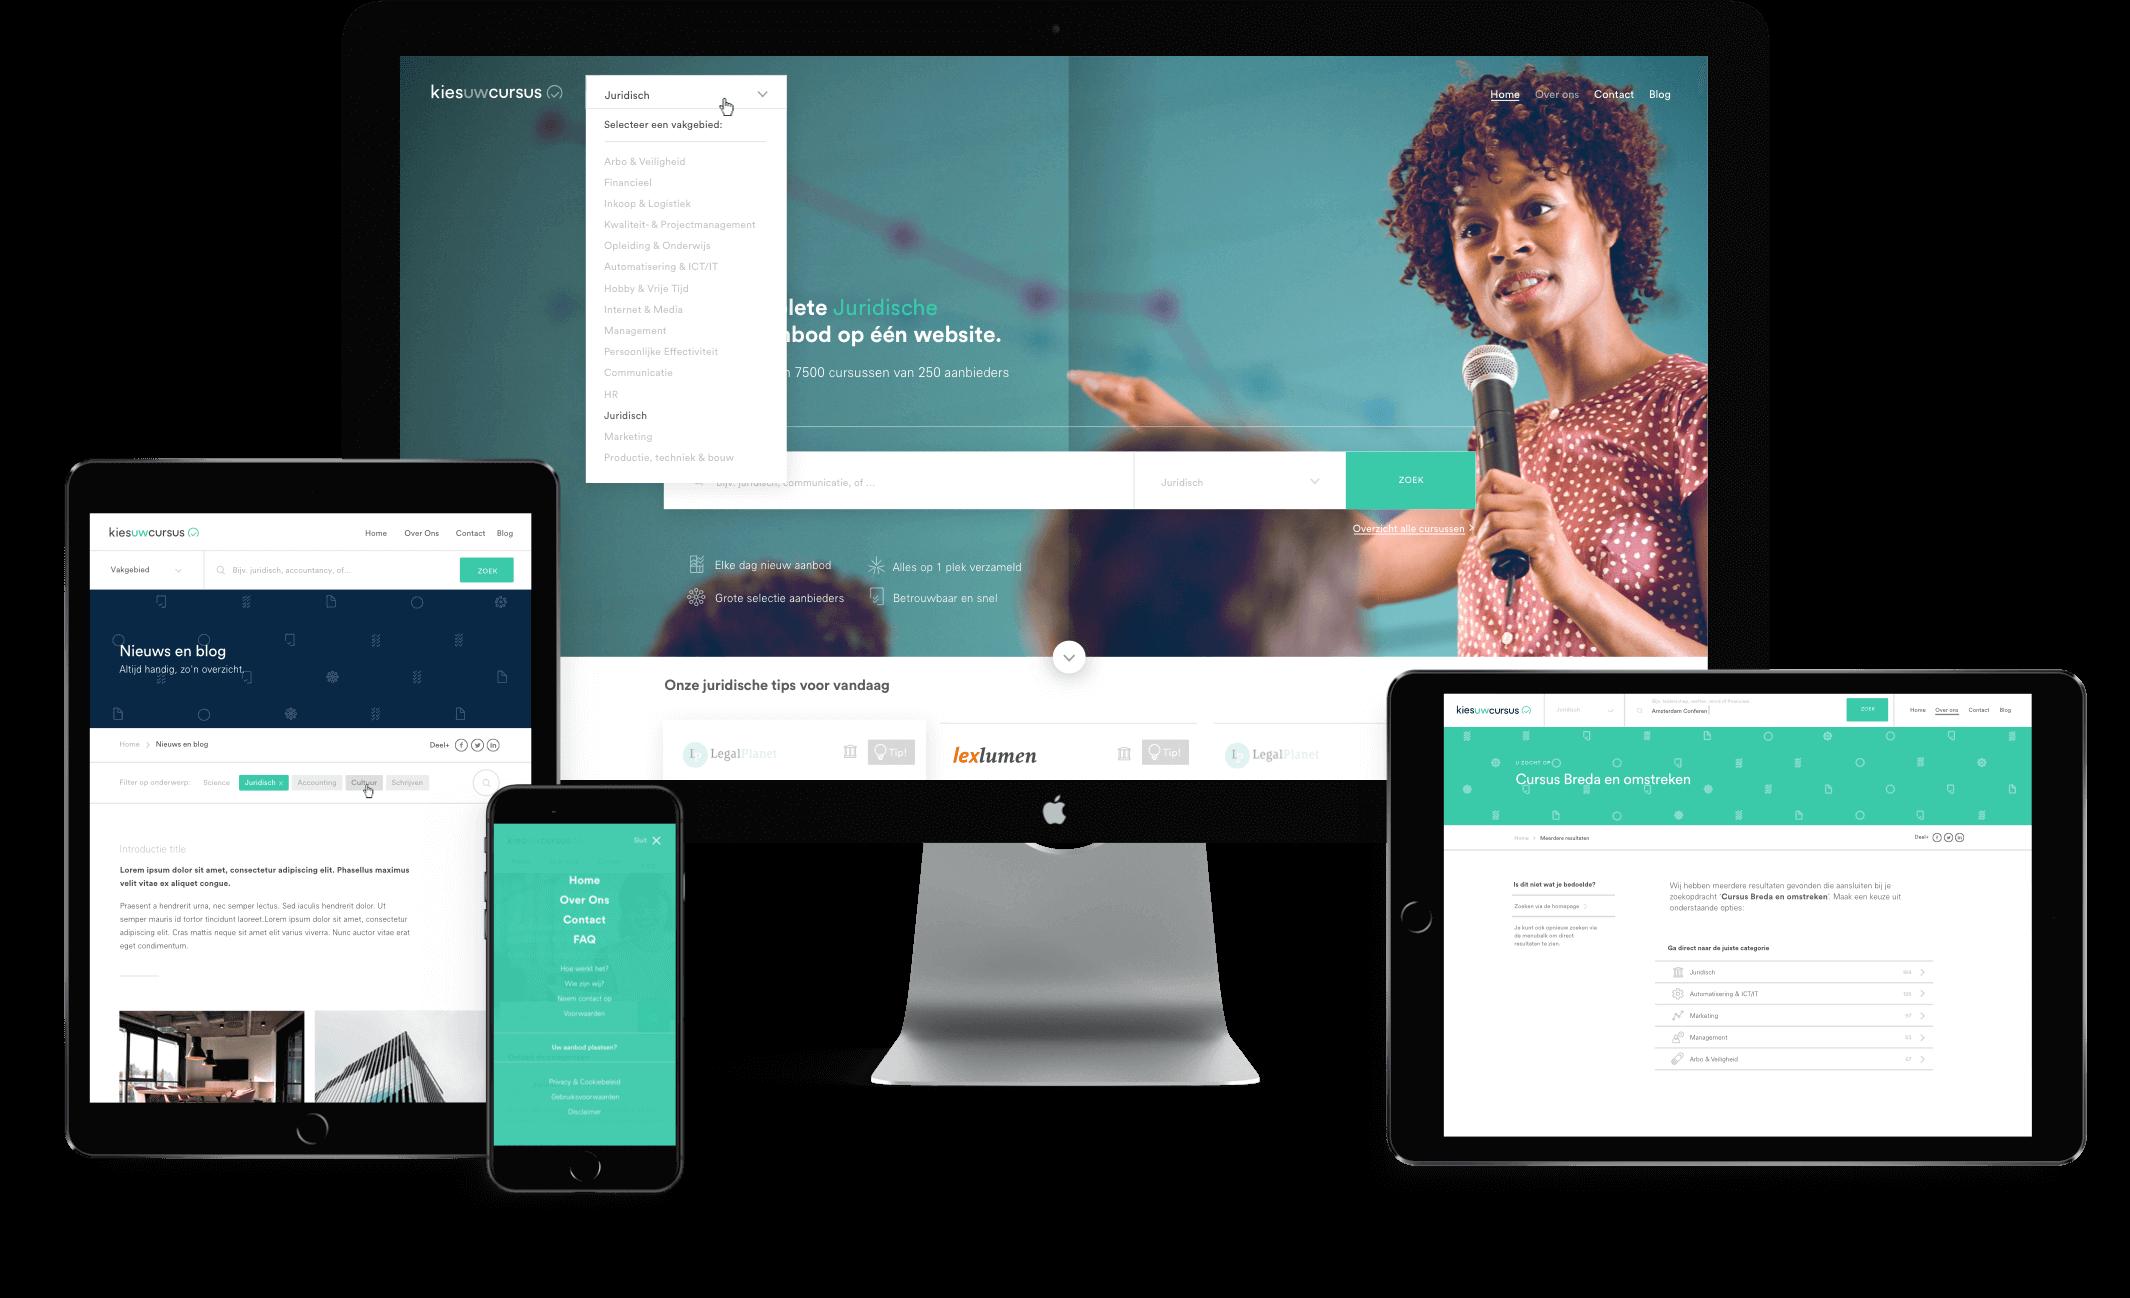 Kies uw Cursus website design displayed on tablet, mobile and desktop